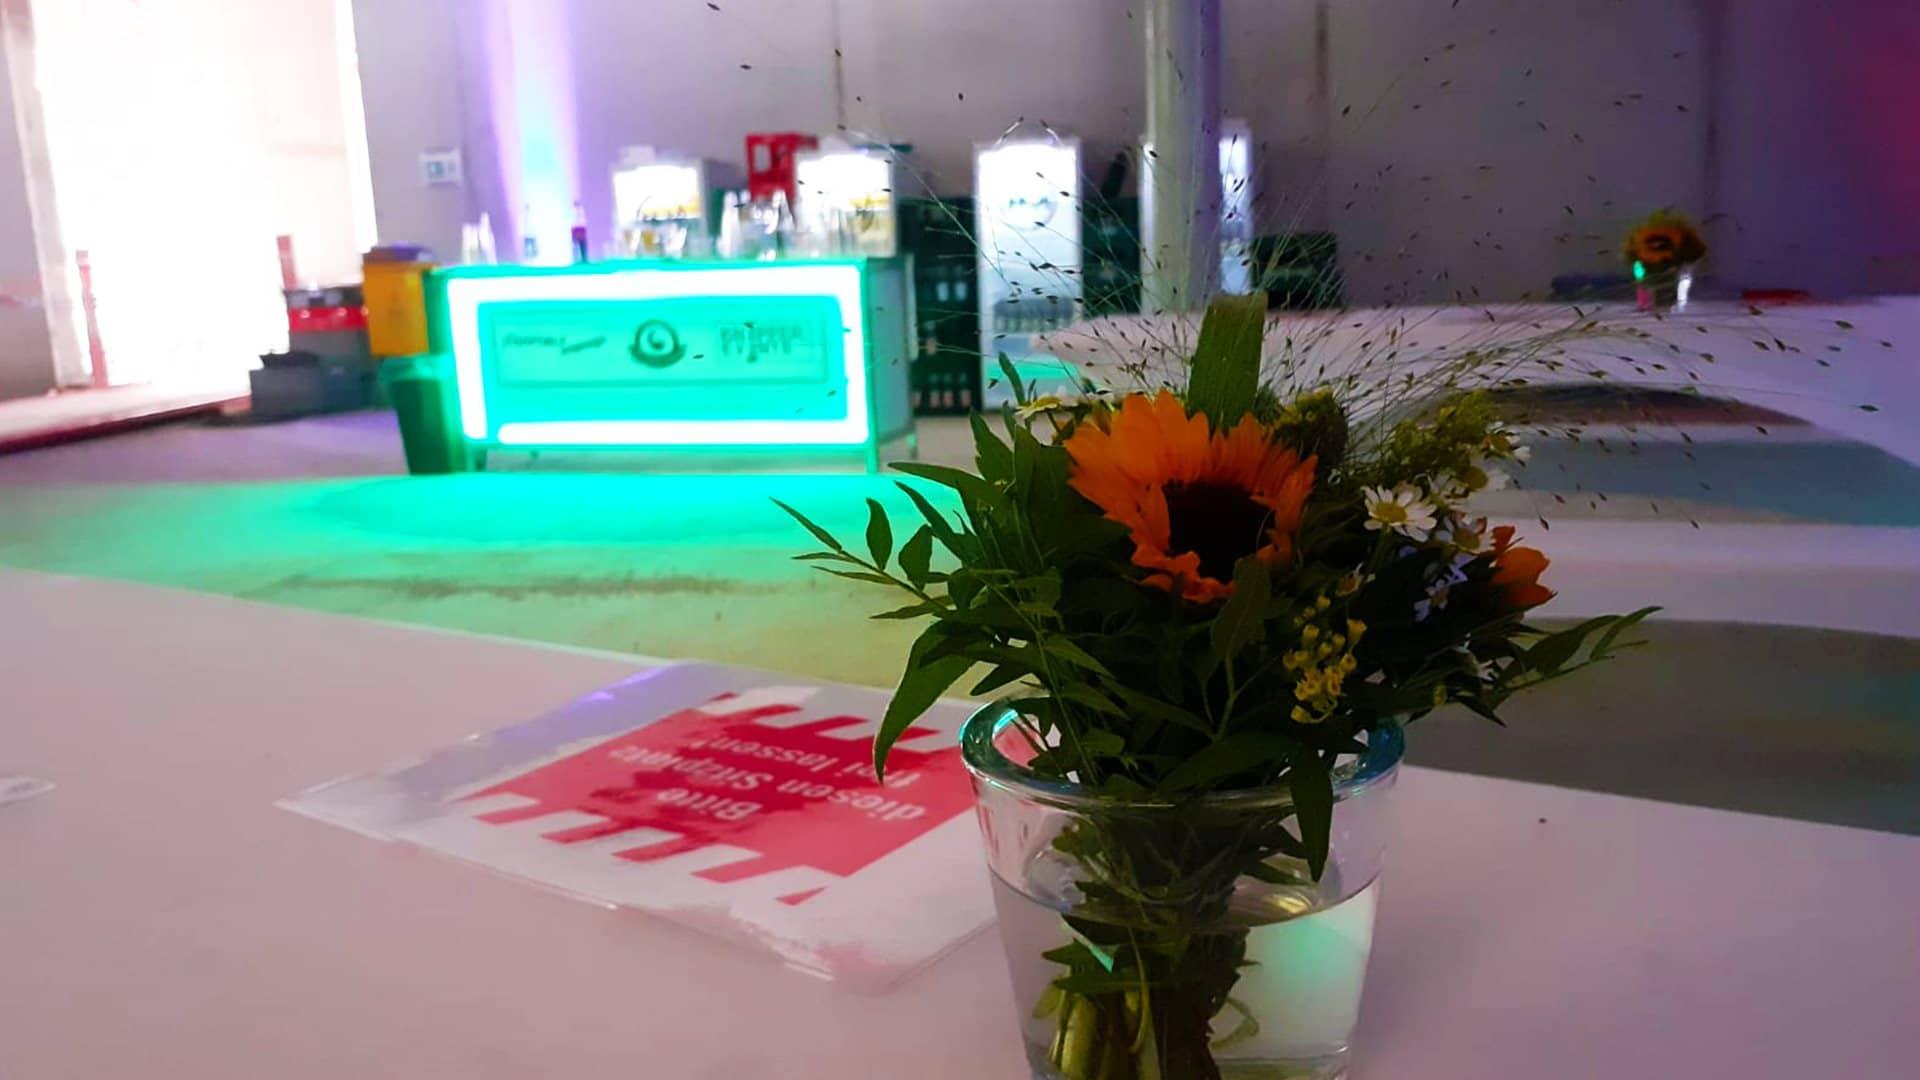 Knepper Events - Firmenevent in Bochum - Richtfest mit Knepper Events (1)